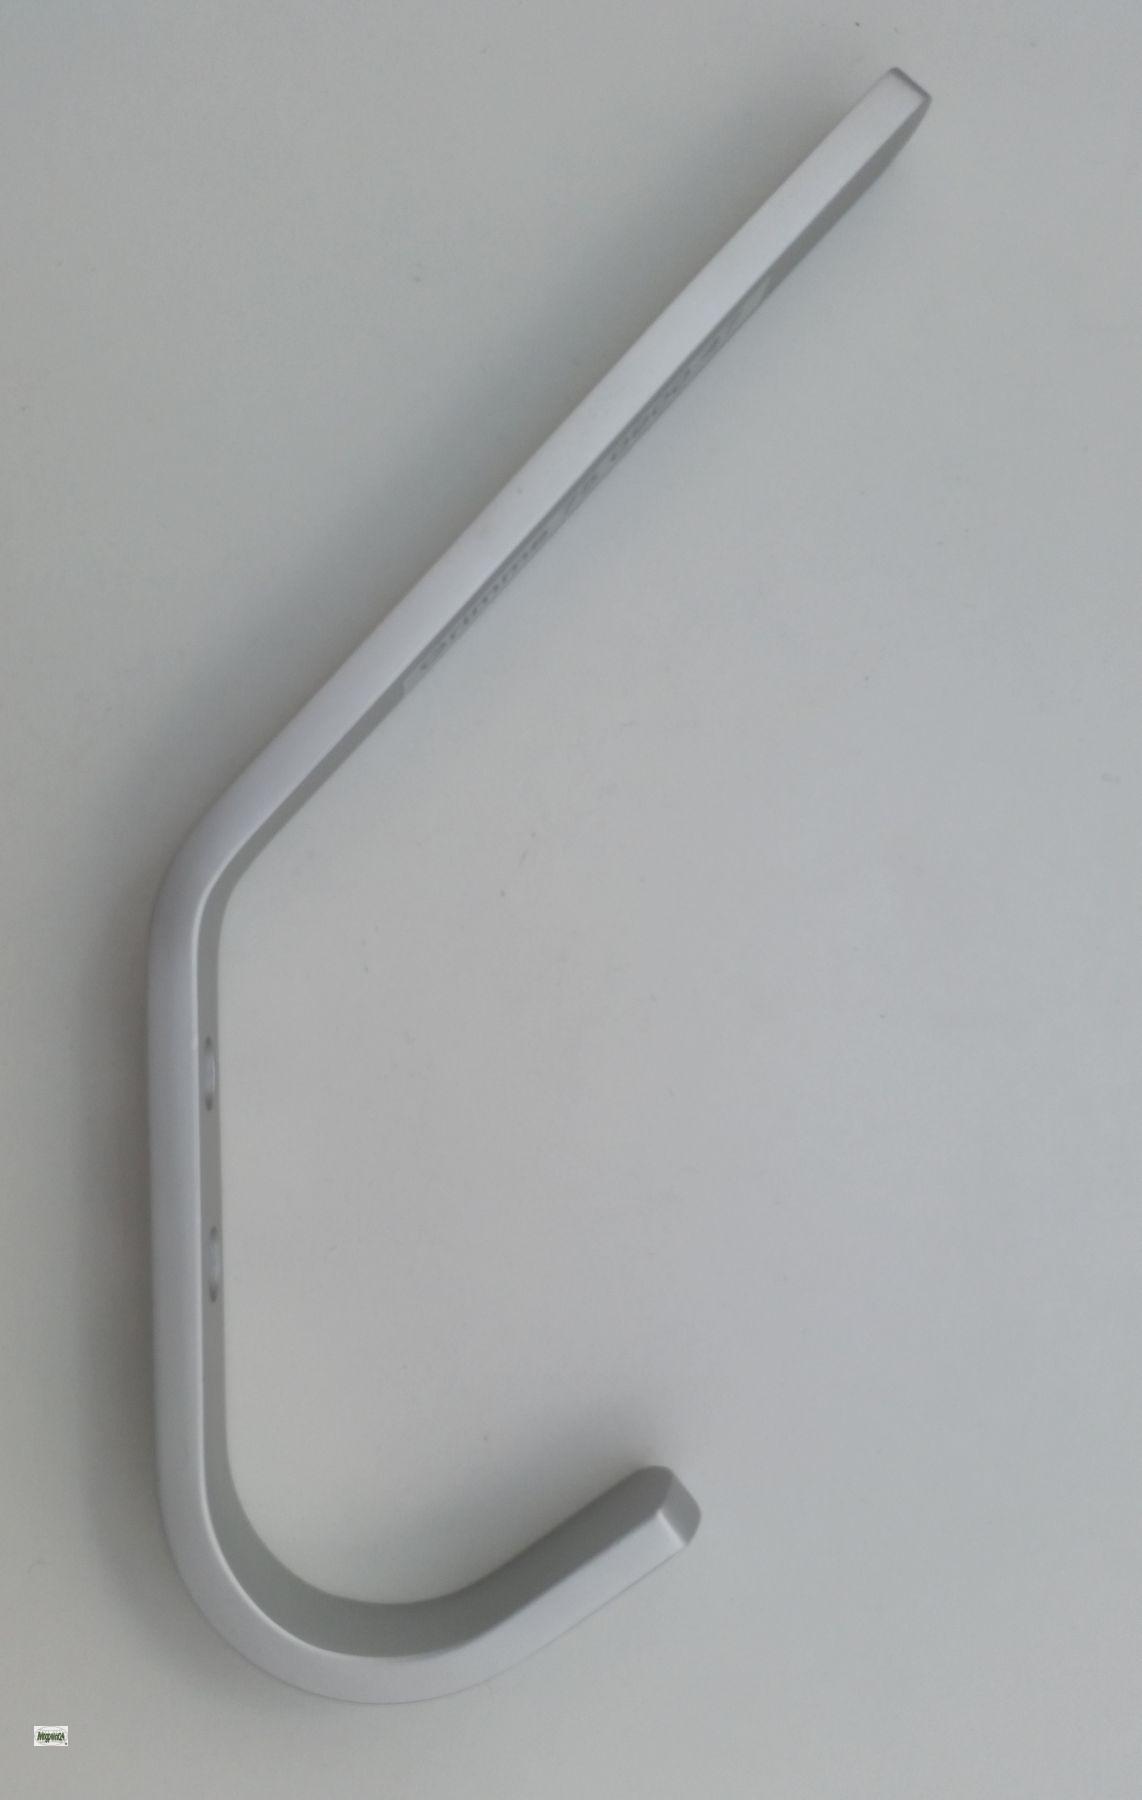 garderobenhaken lang wandhaken mantelhaken aluminium kleiderhaken haken 522 la ebay. Black Bedroom Furniture Sets. Home Design Ideas